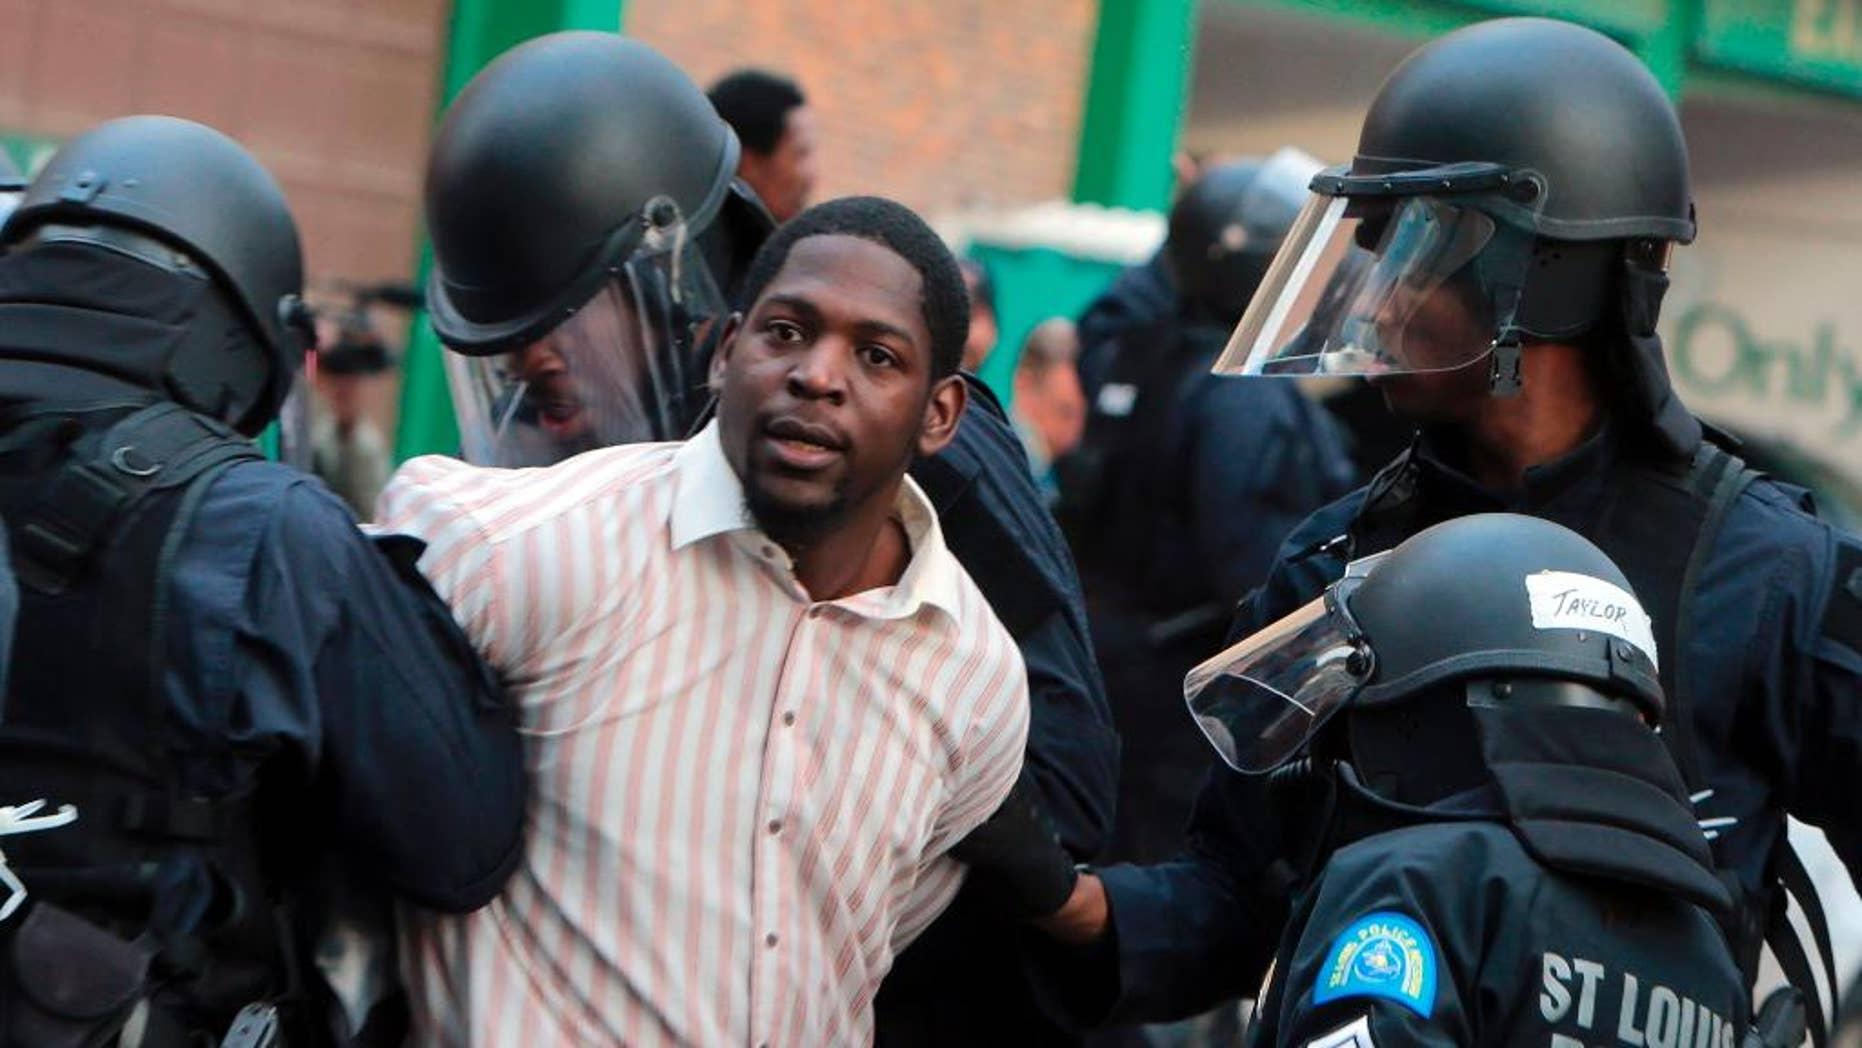 Police arrest protester Derrick Robinson, Sunday, Nov. 30, 2014, in St. Louis.